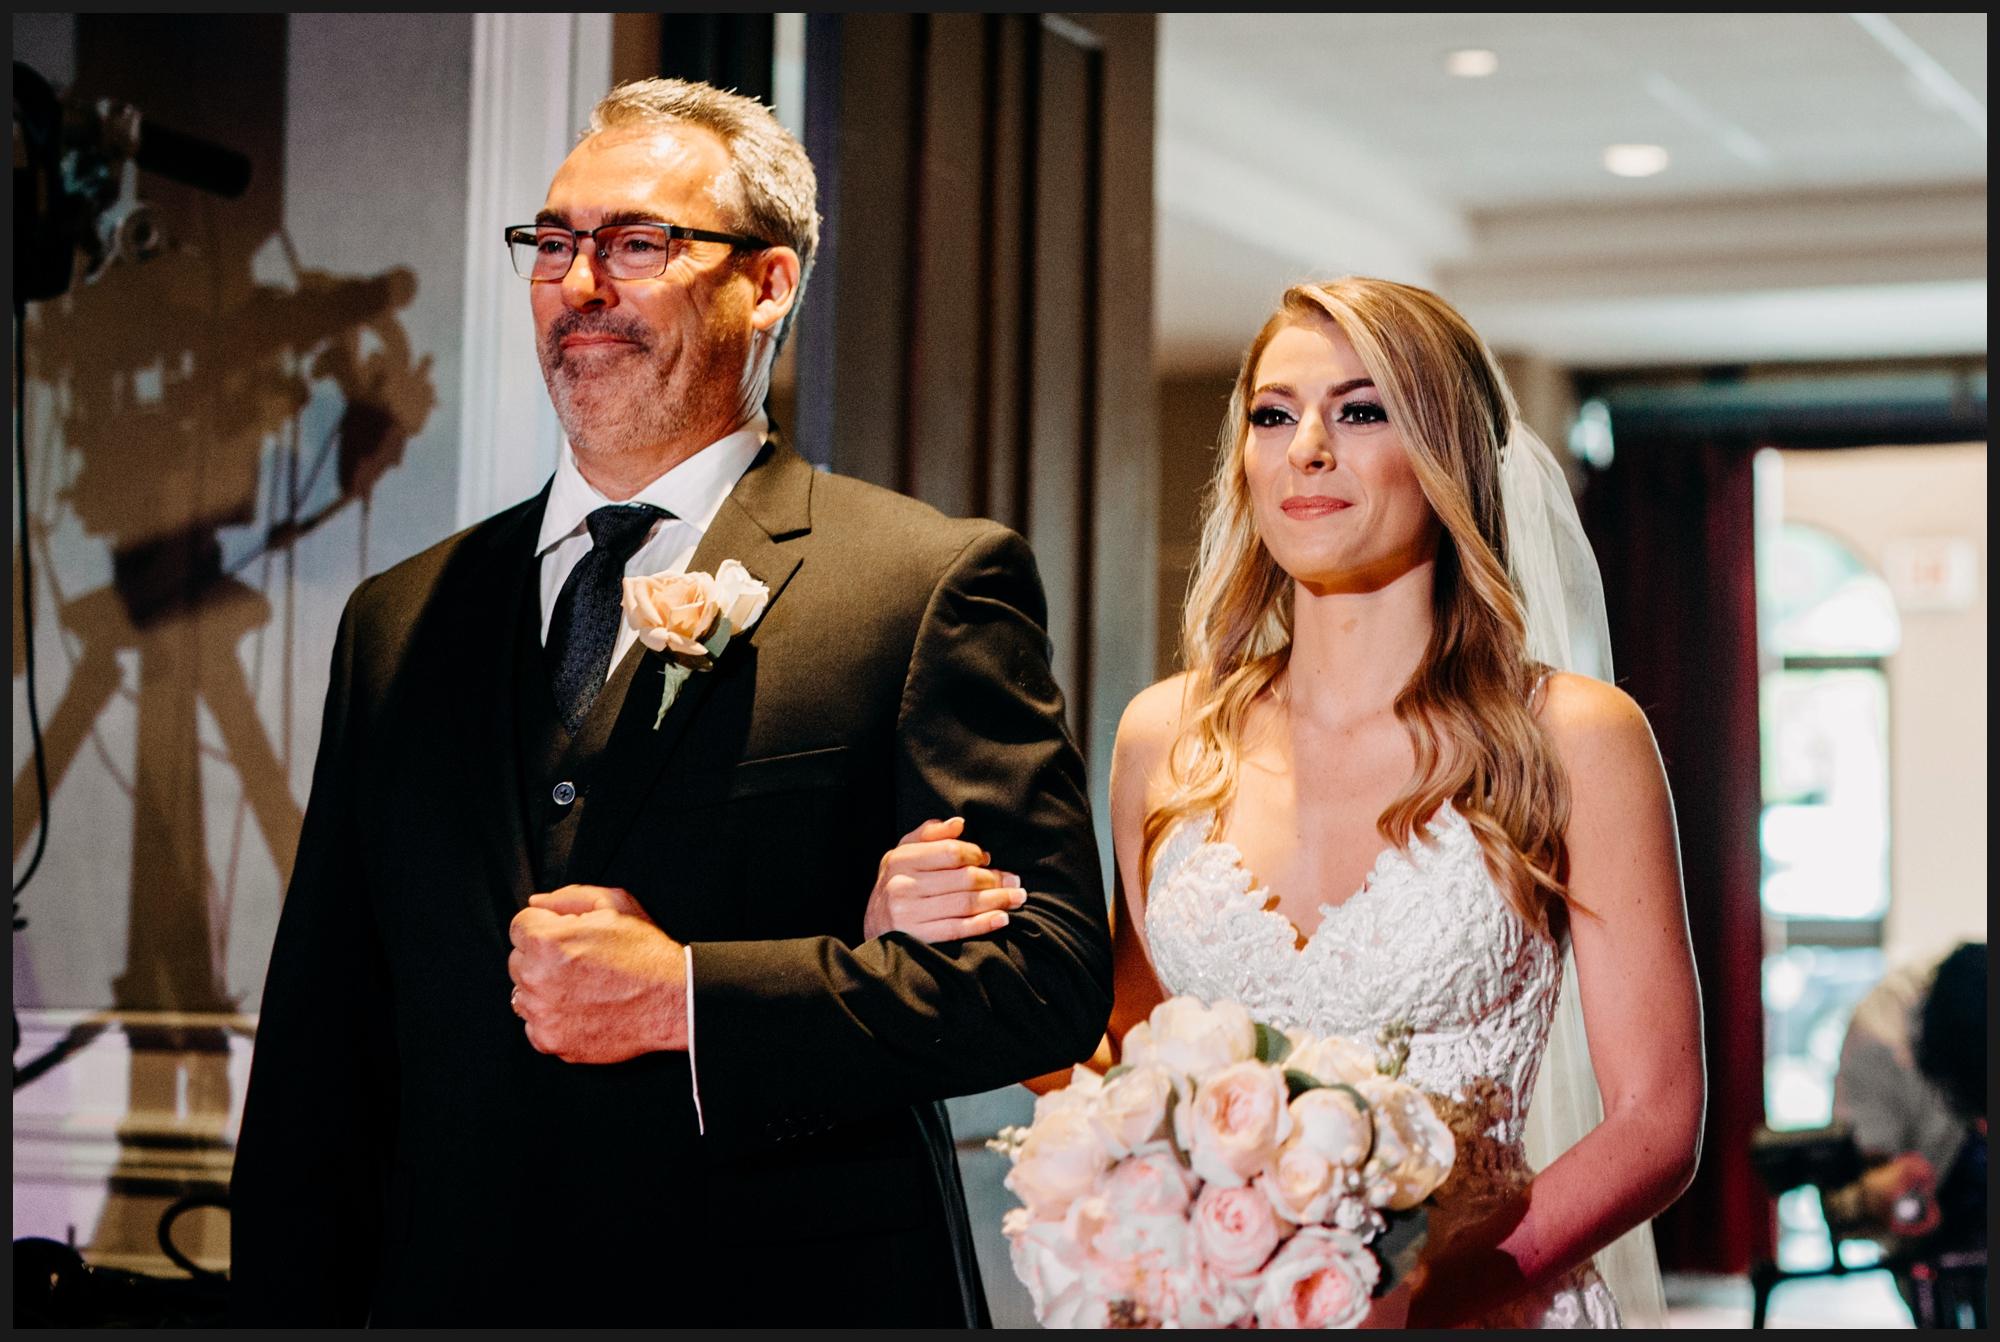 Orlando-Wedding-Photographer-destination-wedding-photographer-florida-wedding-photographer-bohemian-wedding-photographer_0070.jpg